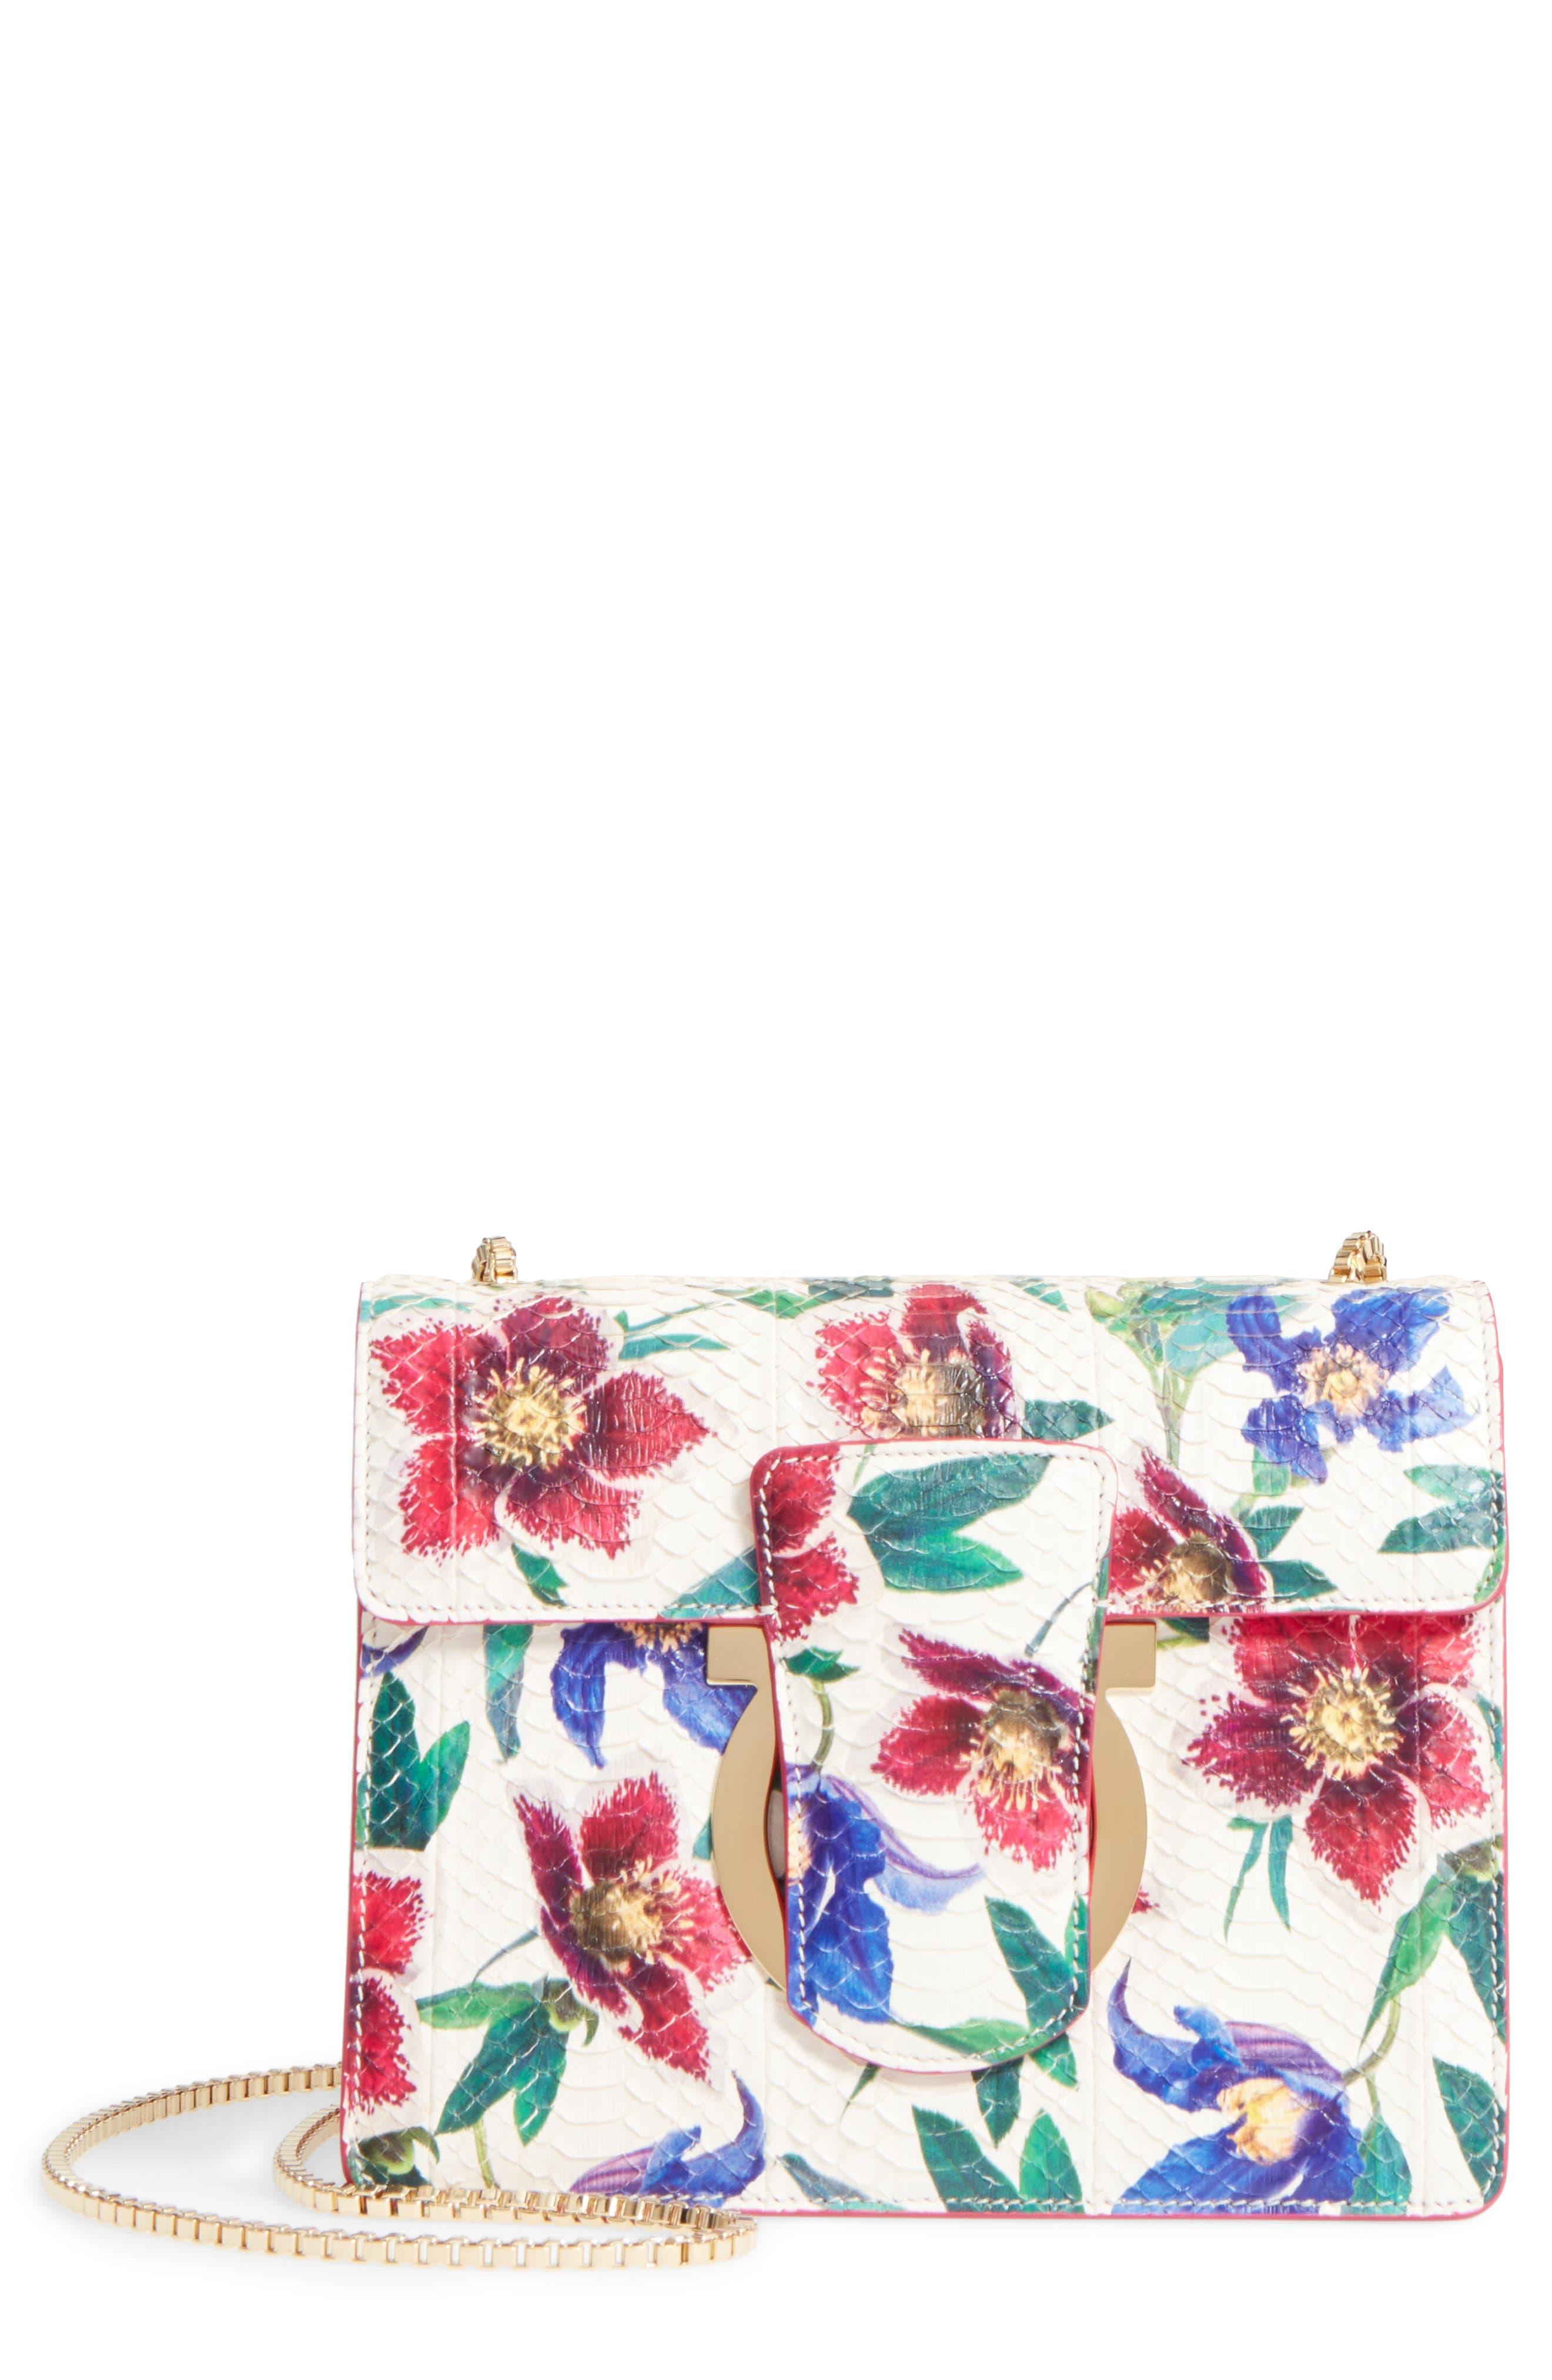 Salvatore Ferragamo Small Thalia Floral Print Genuine Snakeskin Shoulder Bag